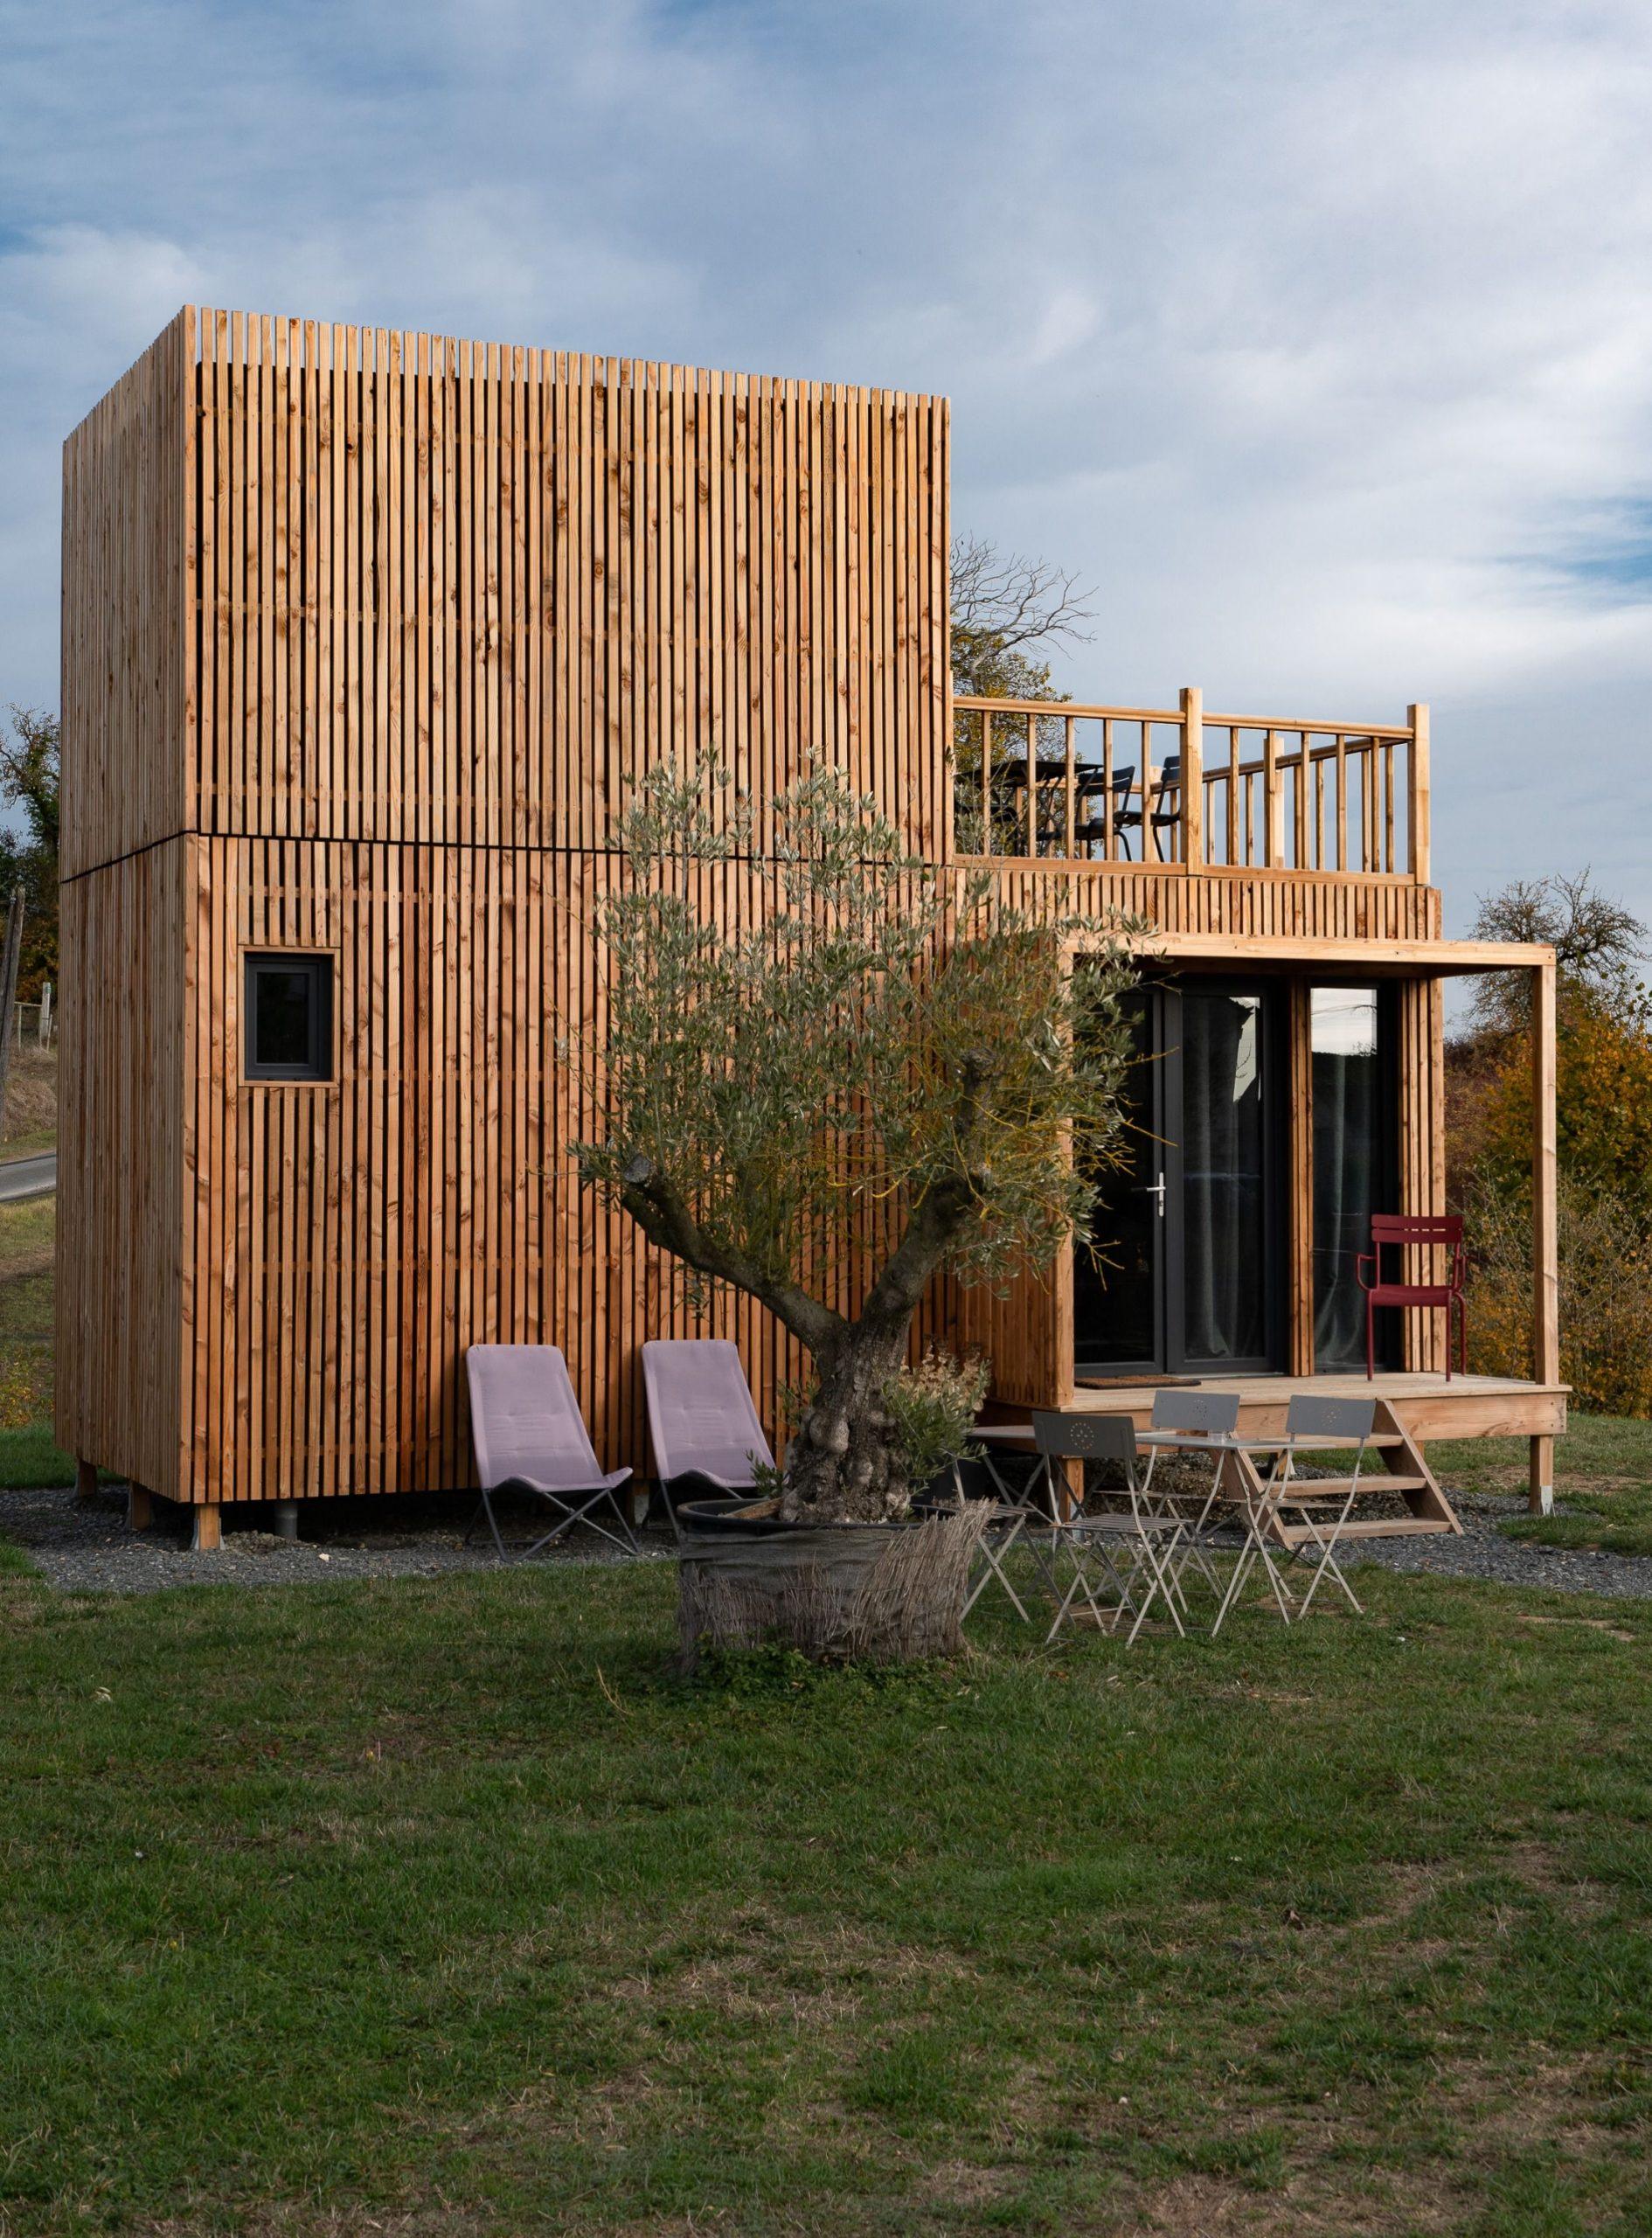 Abri De Jardin Permis De Construire Best Of Un Studio De Jardin Greenkub Vous Permet De Gagner Jusqu